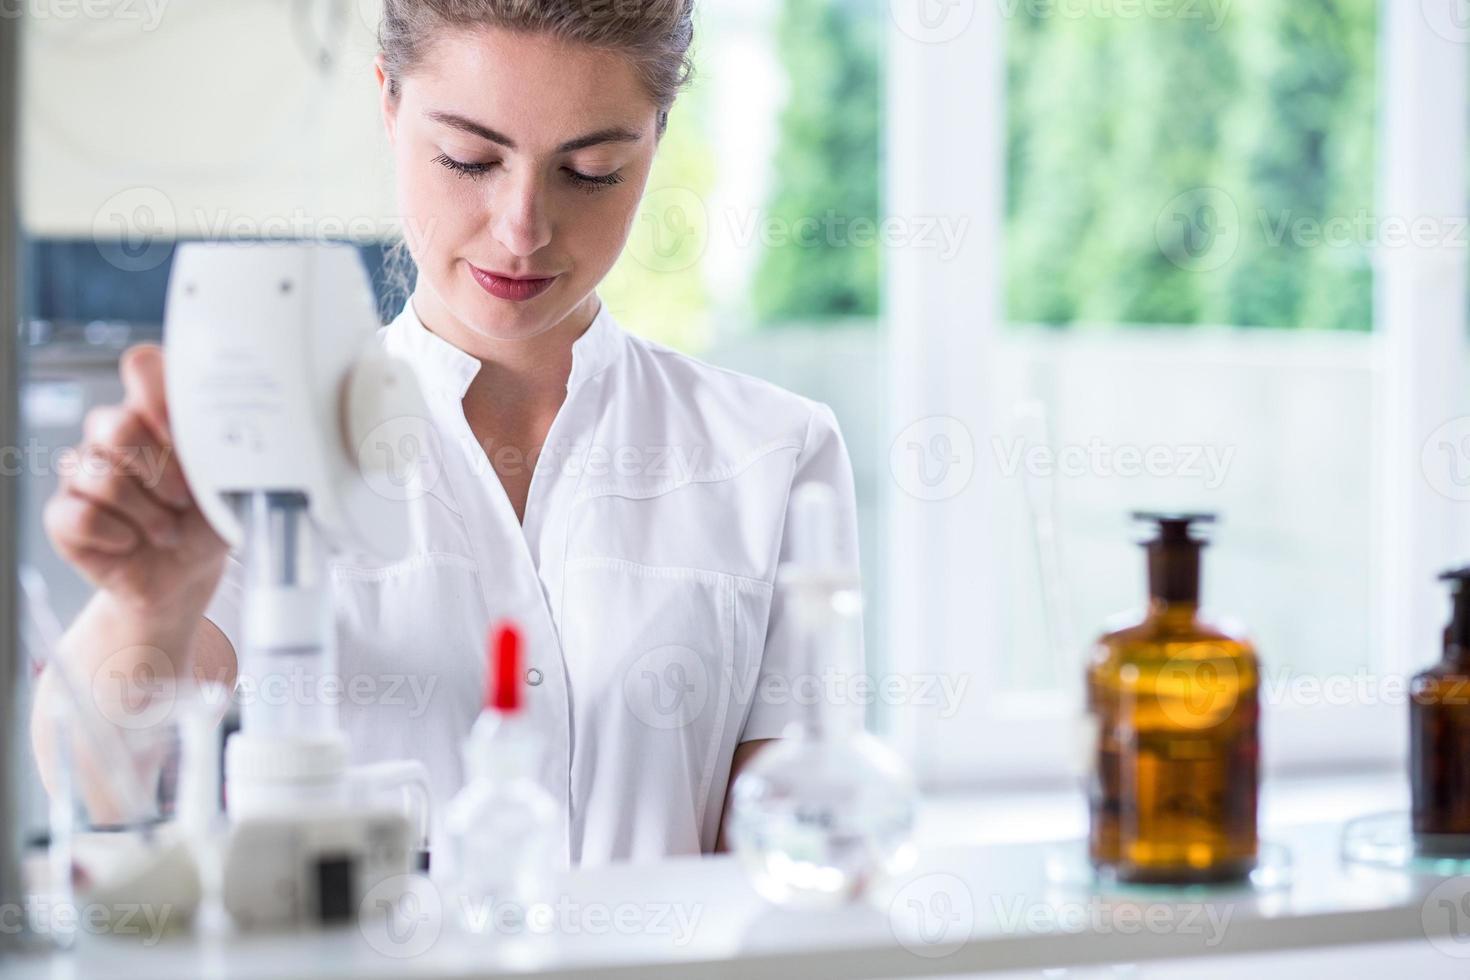 laboratoriumtechnicus die chemie-experiment doet foto